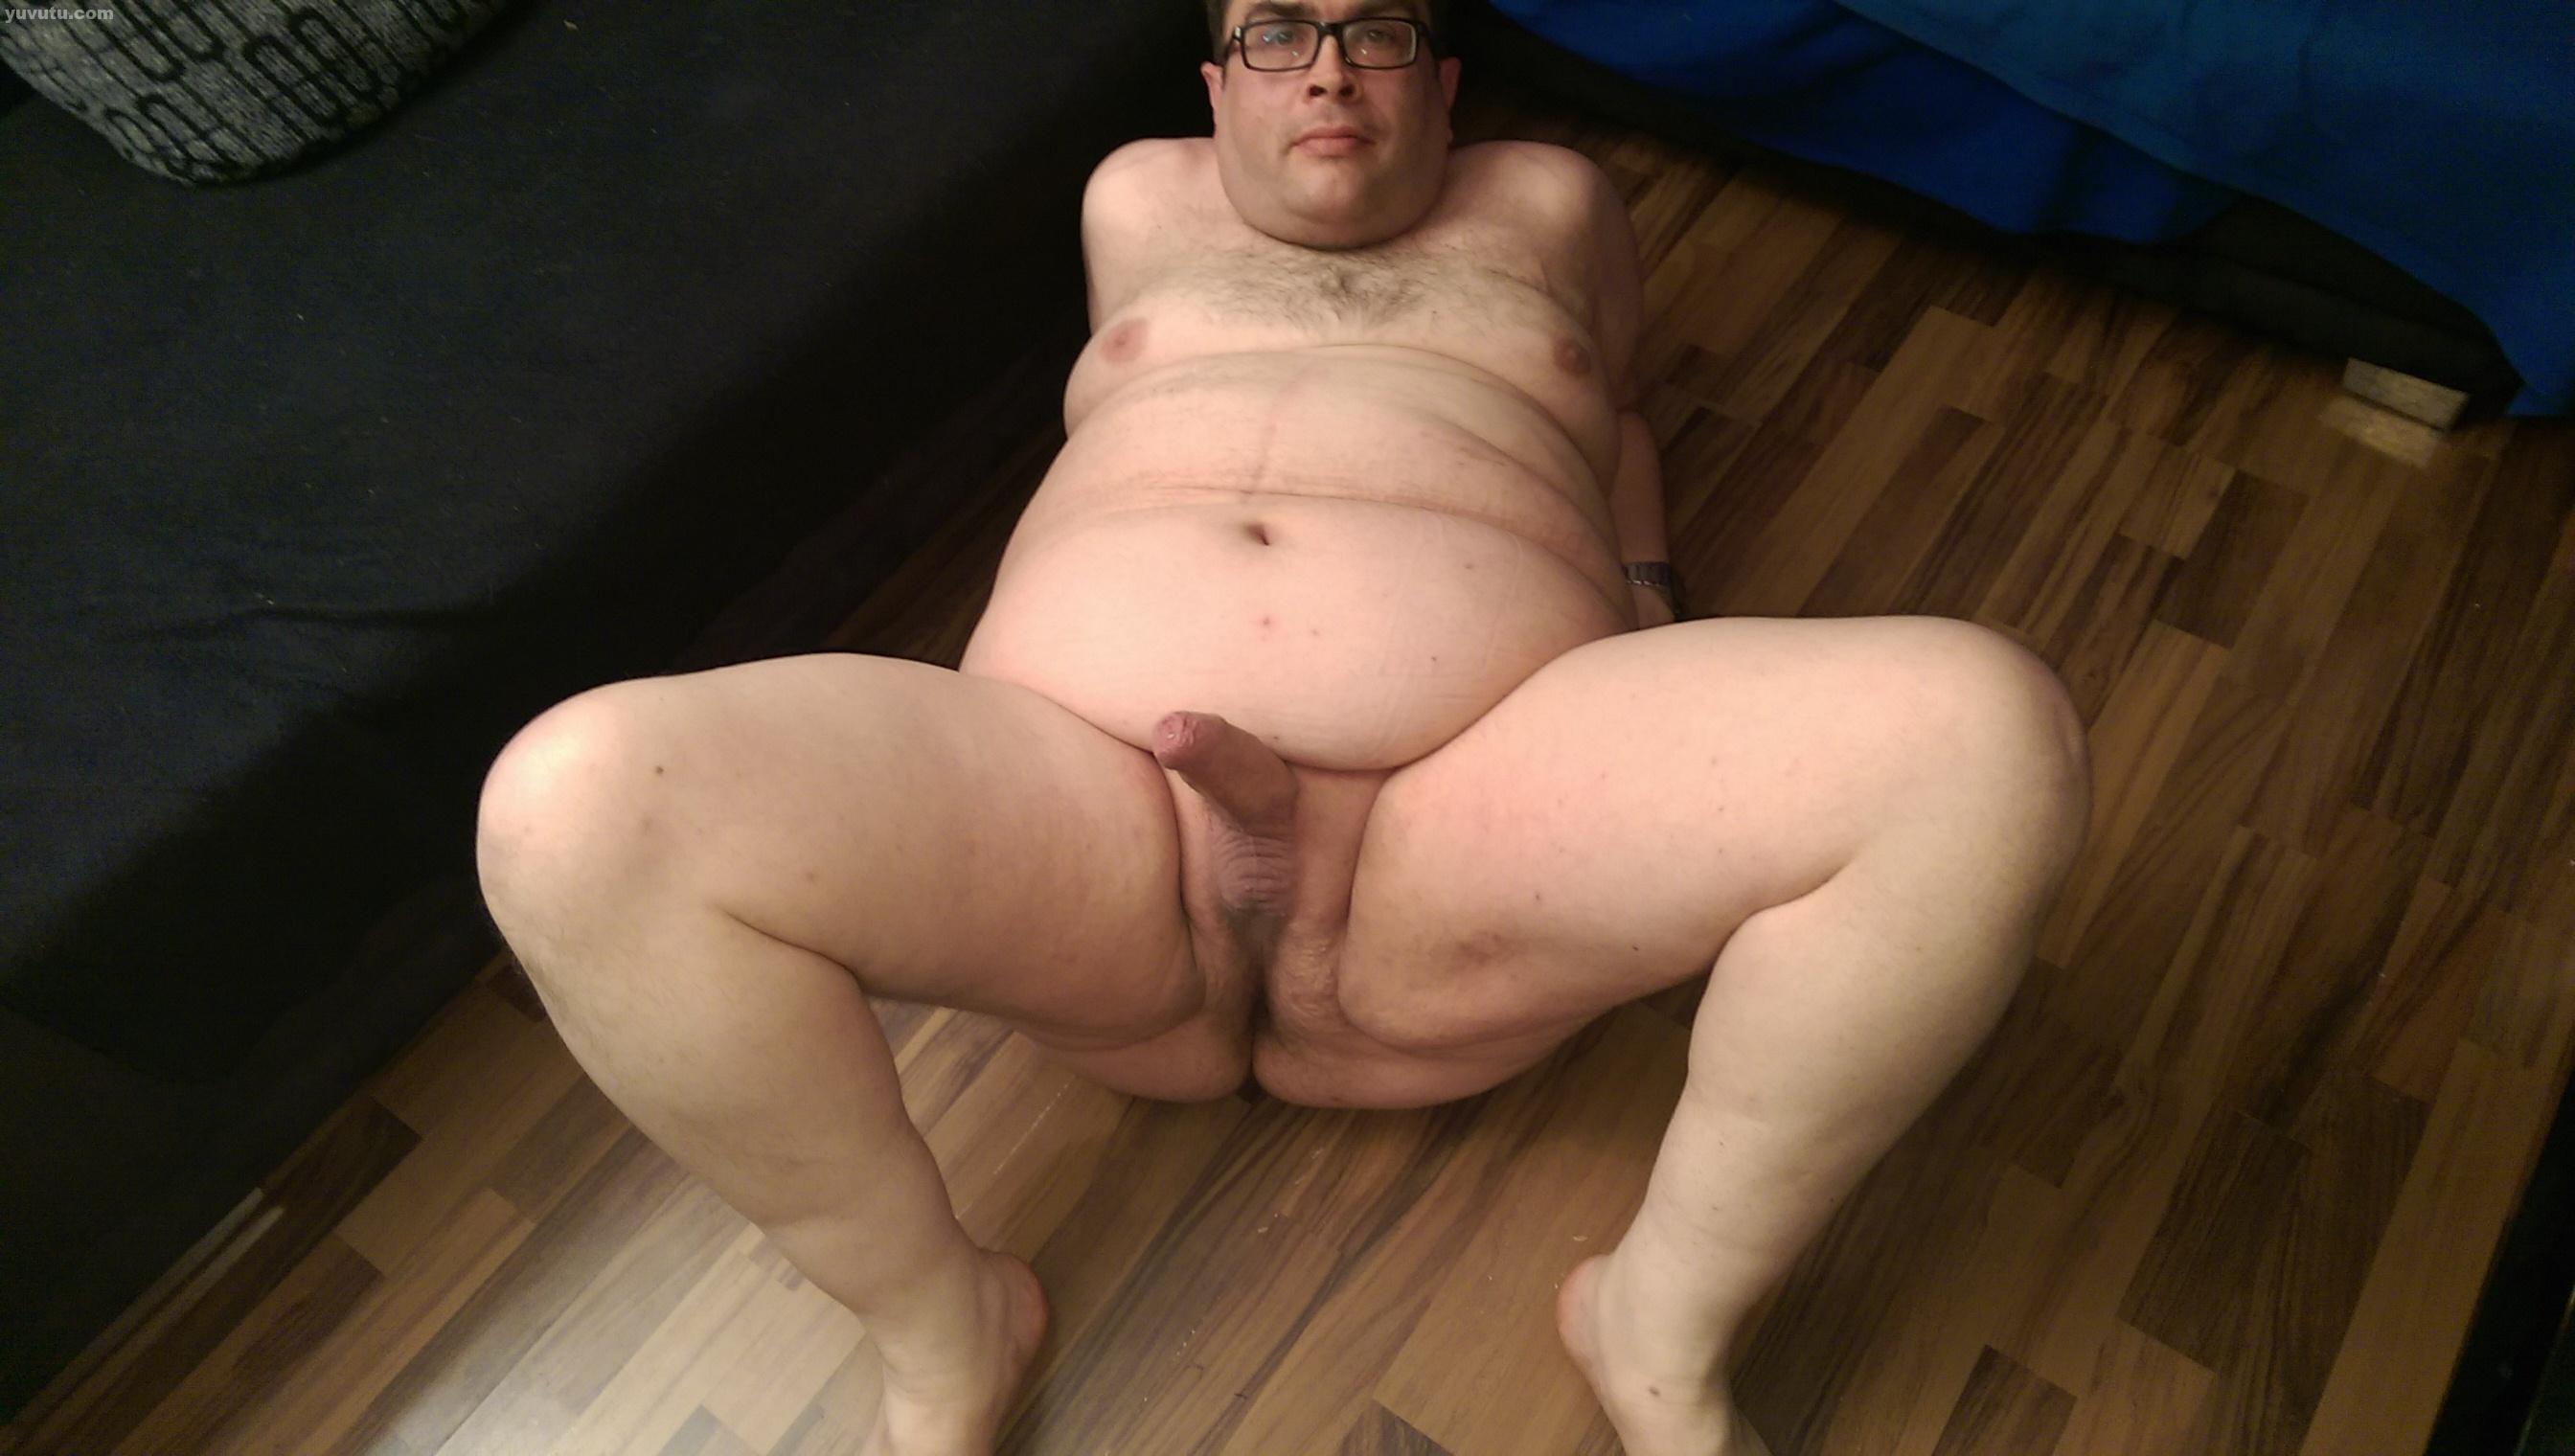 Amateur Chubby Male Porn gay fetish xxx chubby gay homemade sex | free hot nude porn